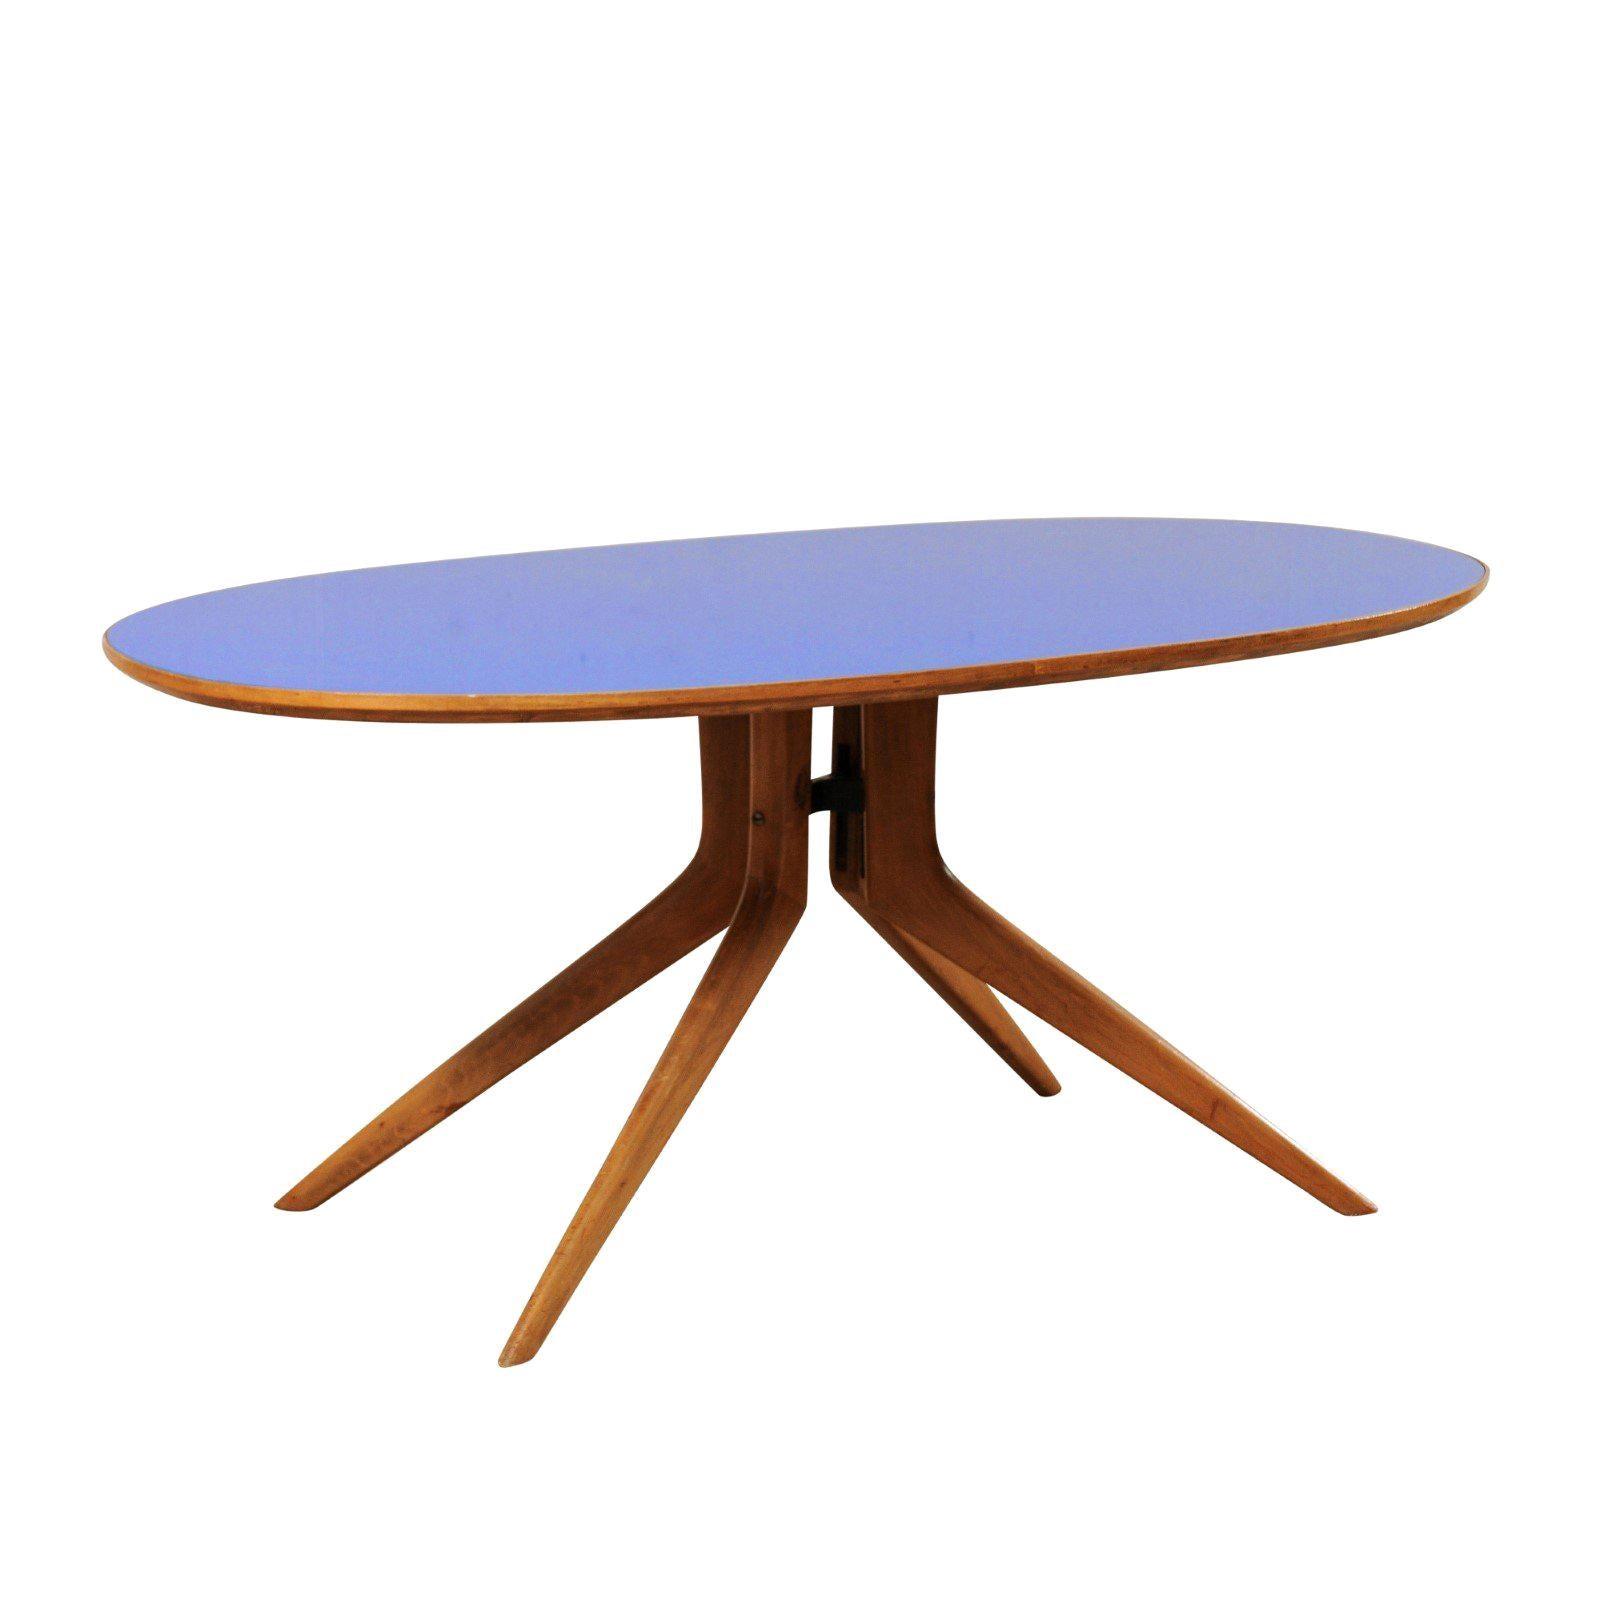 Beau Italian Mid Century Modern Elliptical Table With Retro Blue Top For Sale